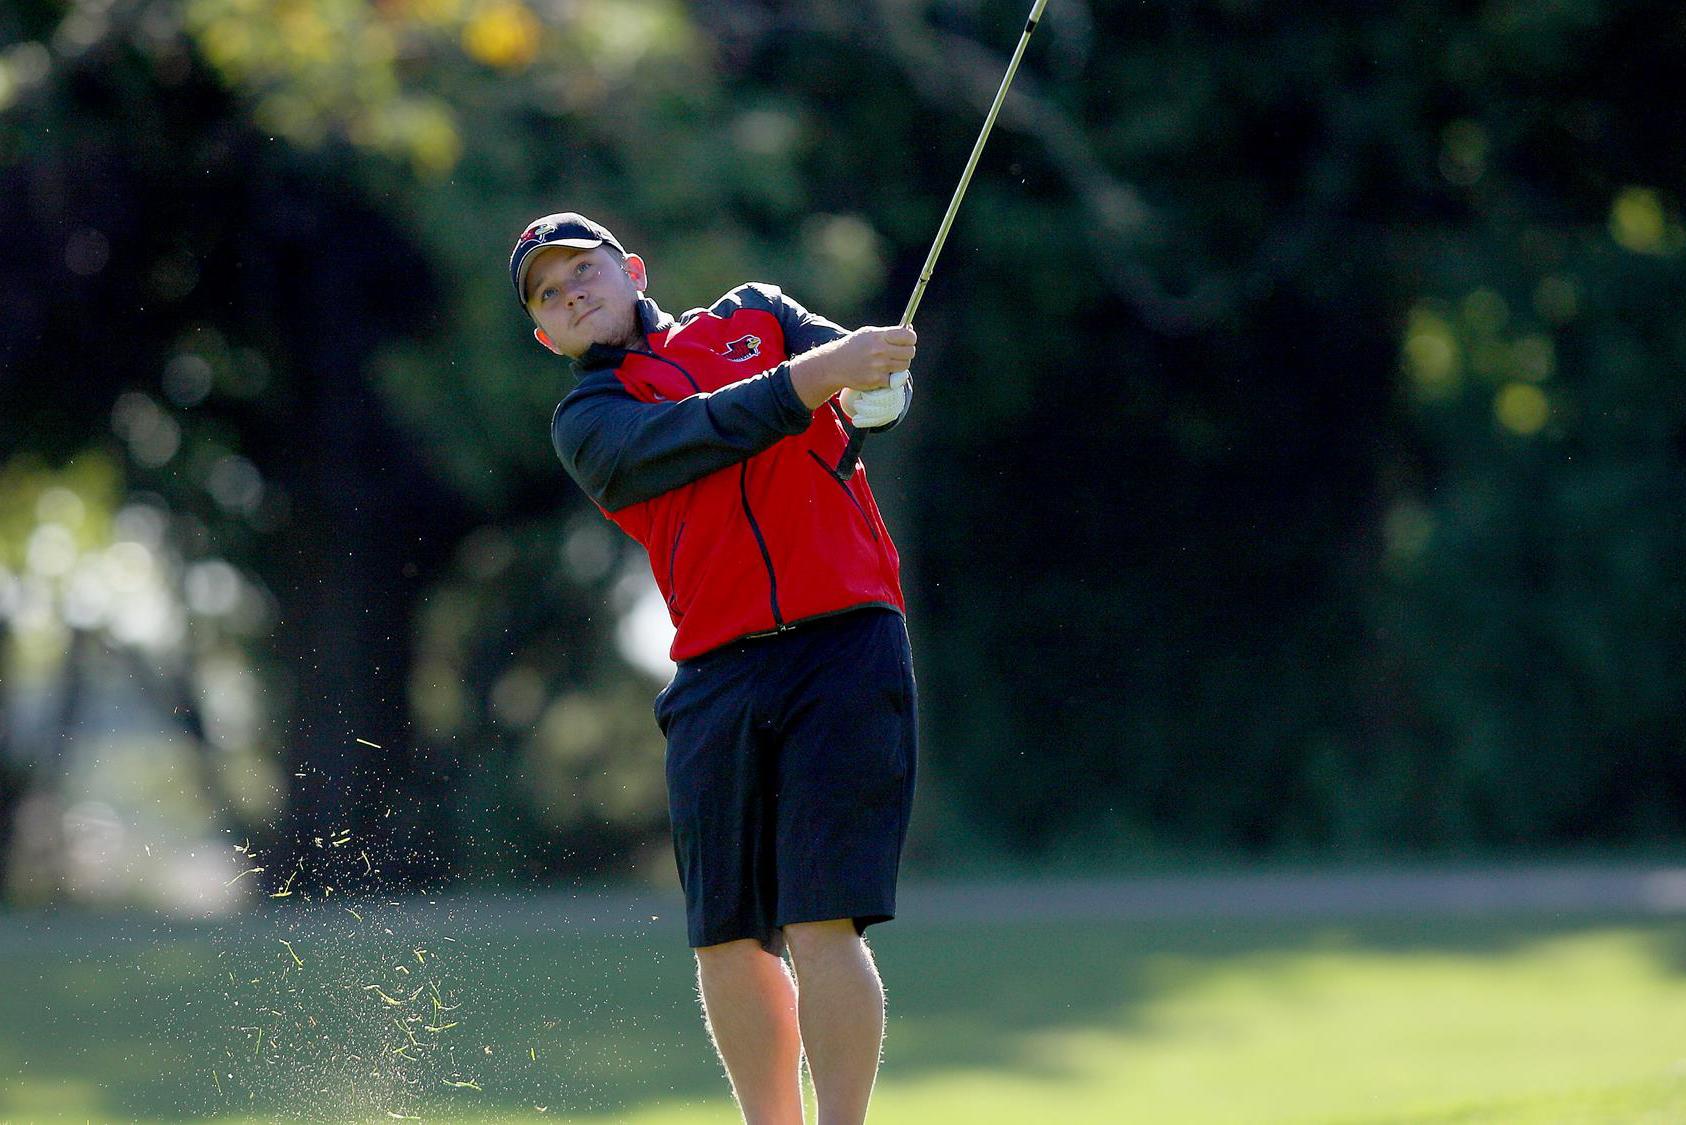 Trent Wallace swinging a golf club